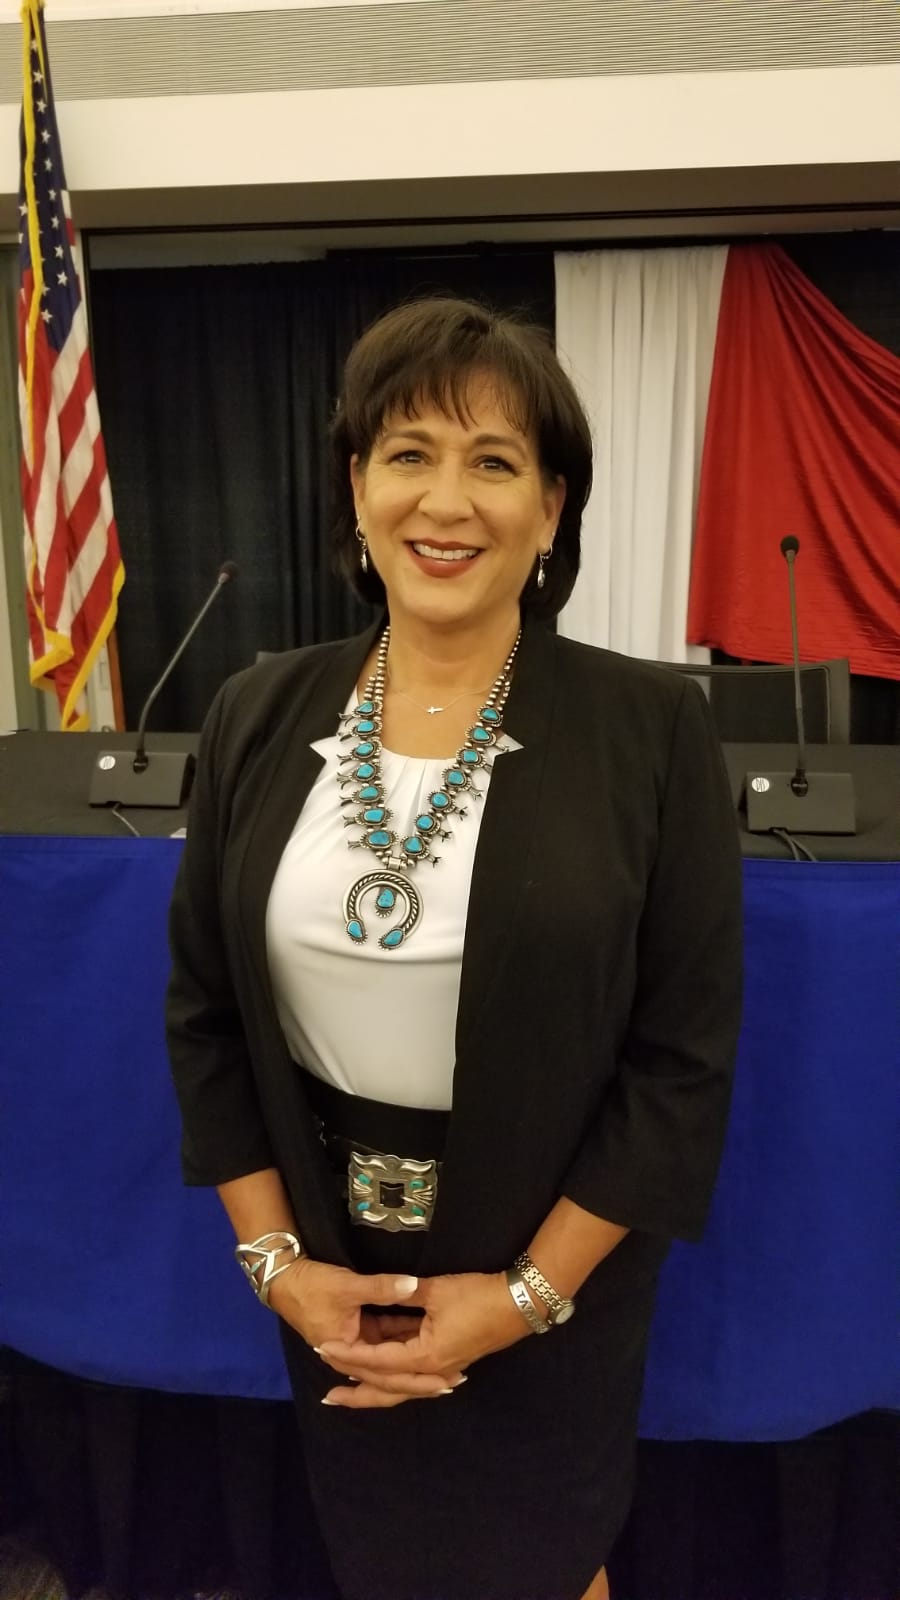 Doreen Garlid sworn in as Tempe's first Native American council member